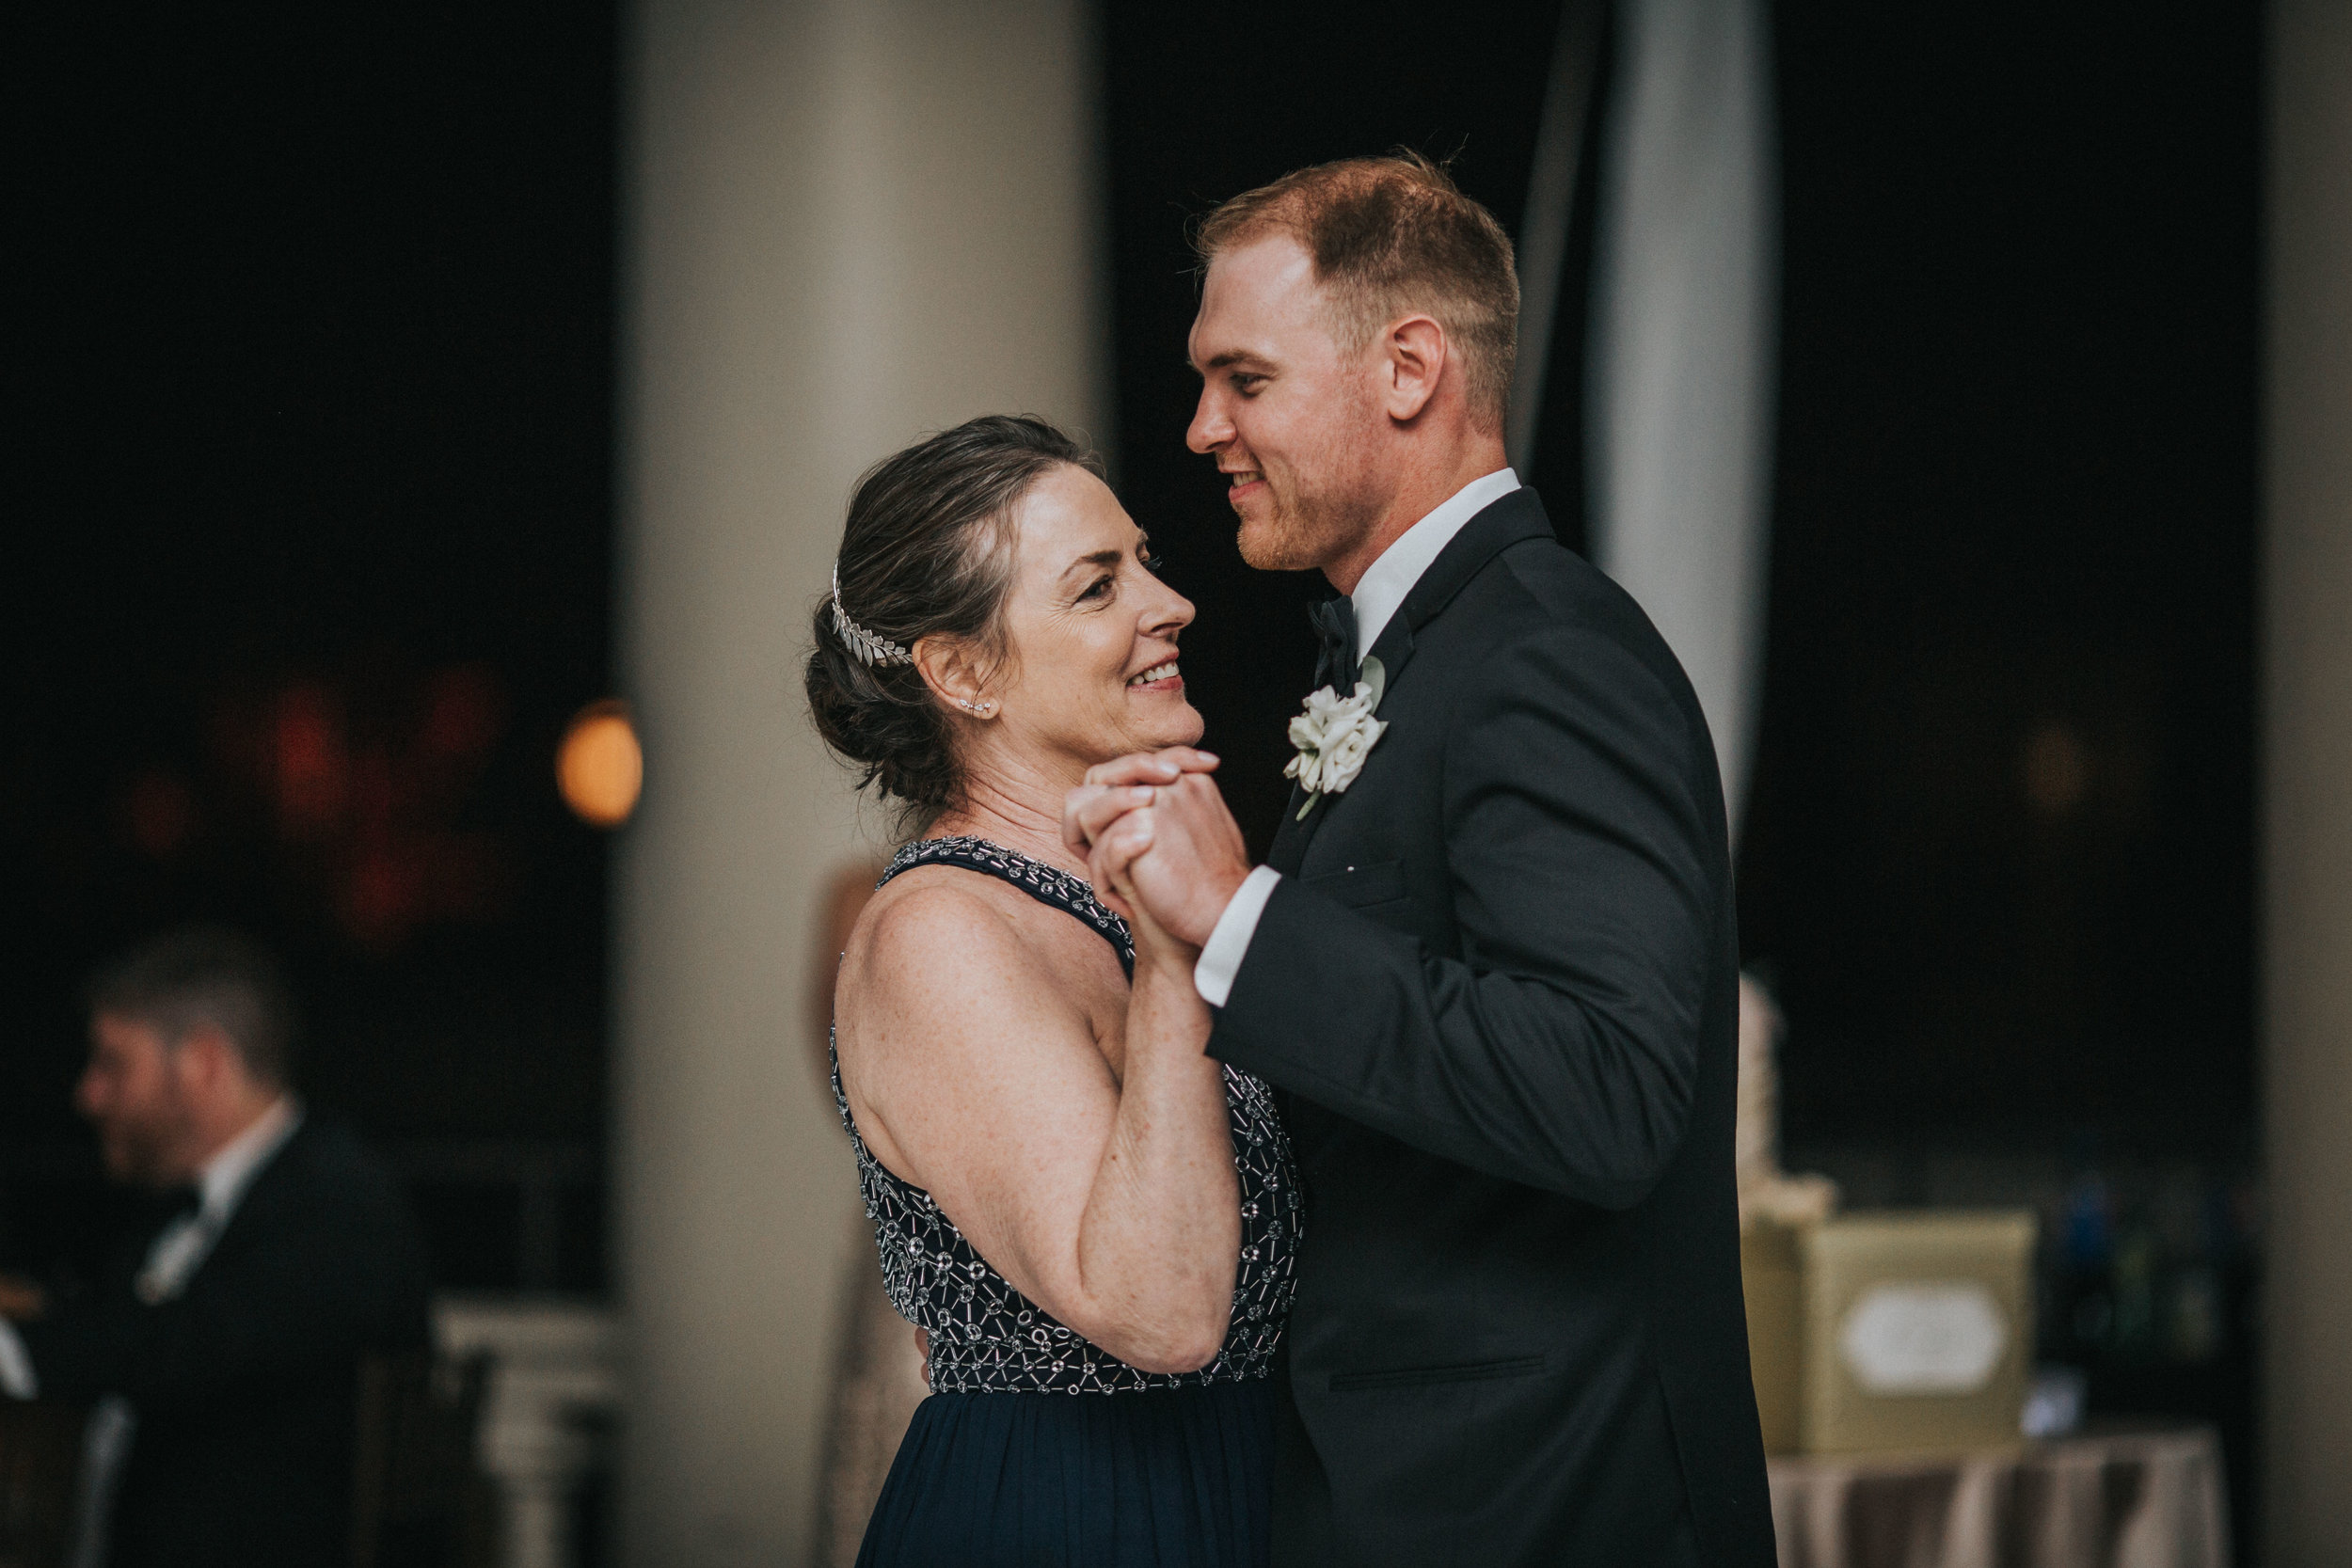 NewJersey_Wedding_Photography_Philadelphia__cescaphe_Waterworks_Reception-171.jpg